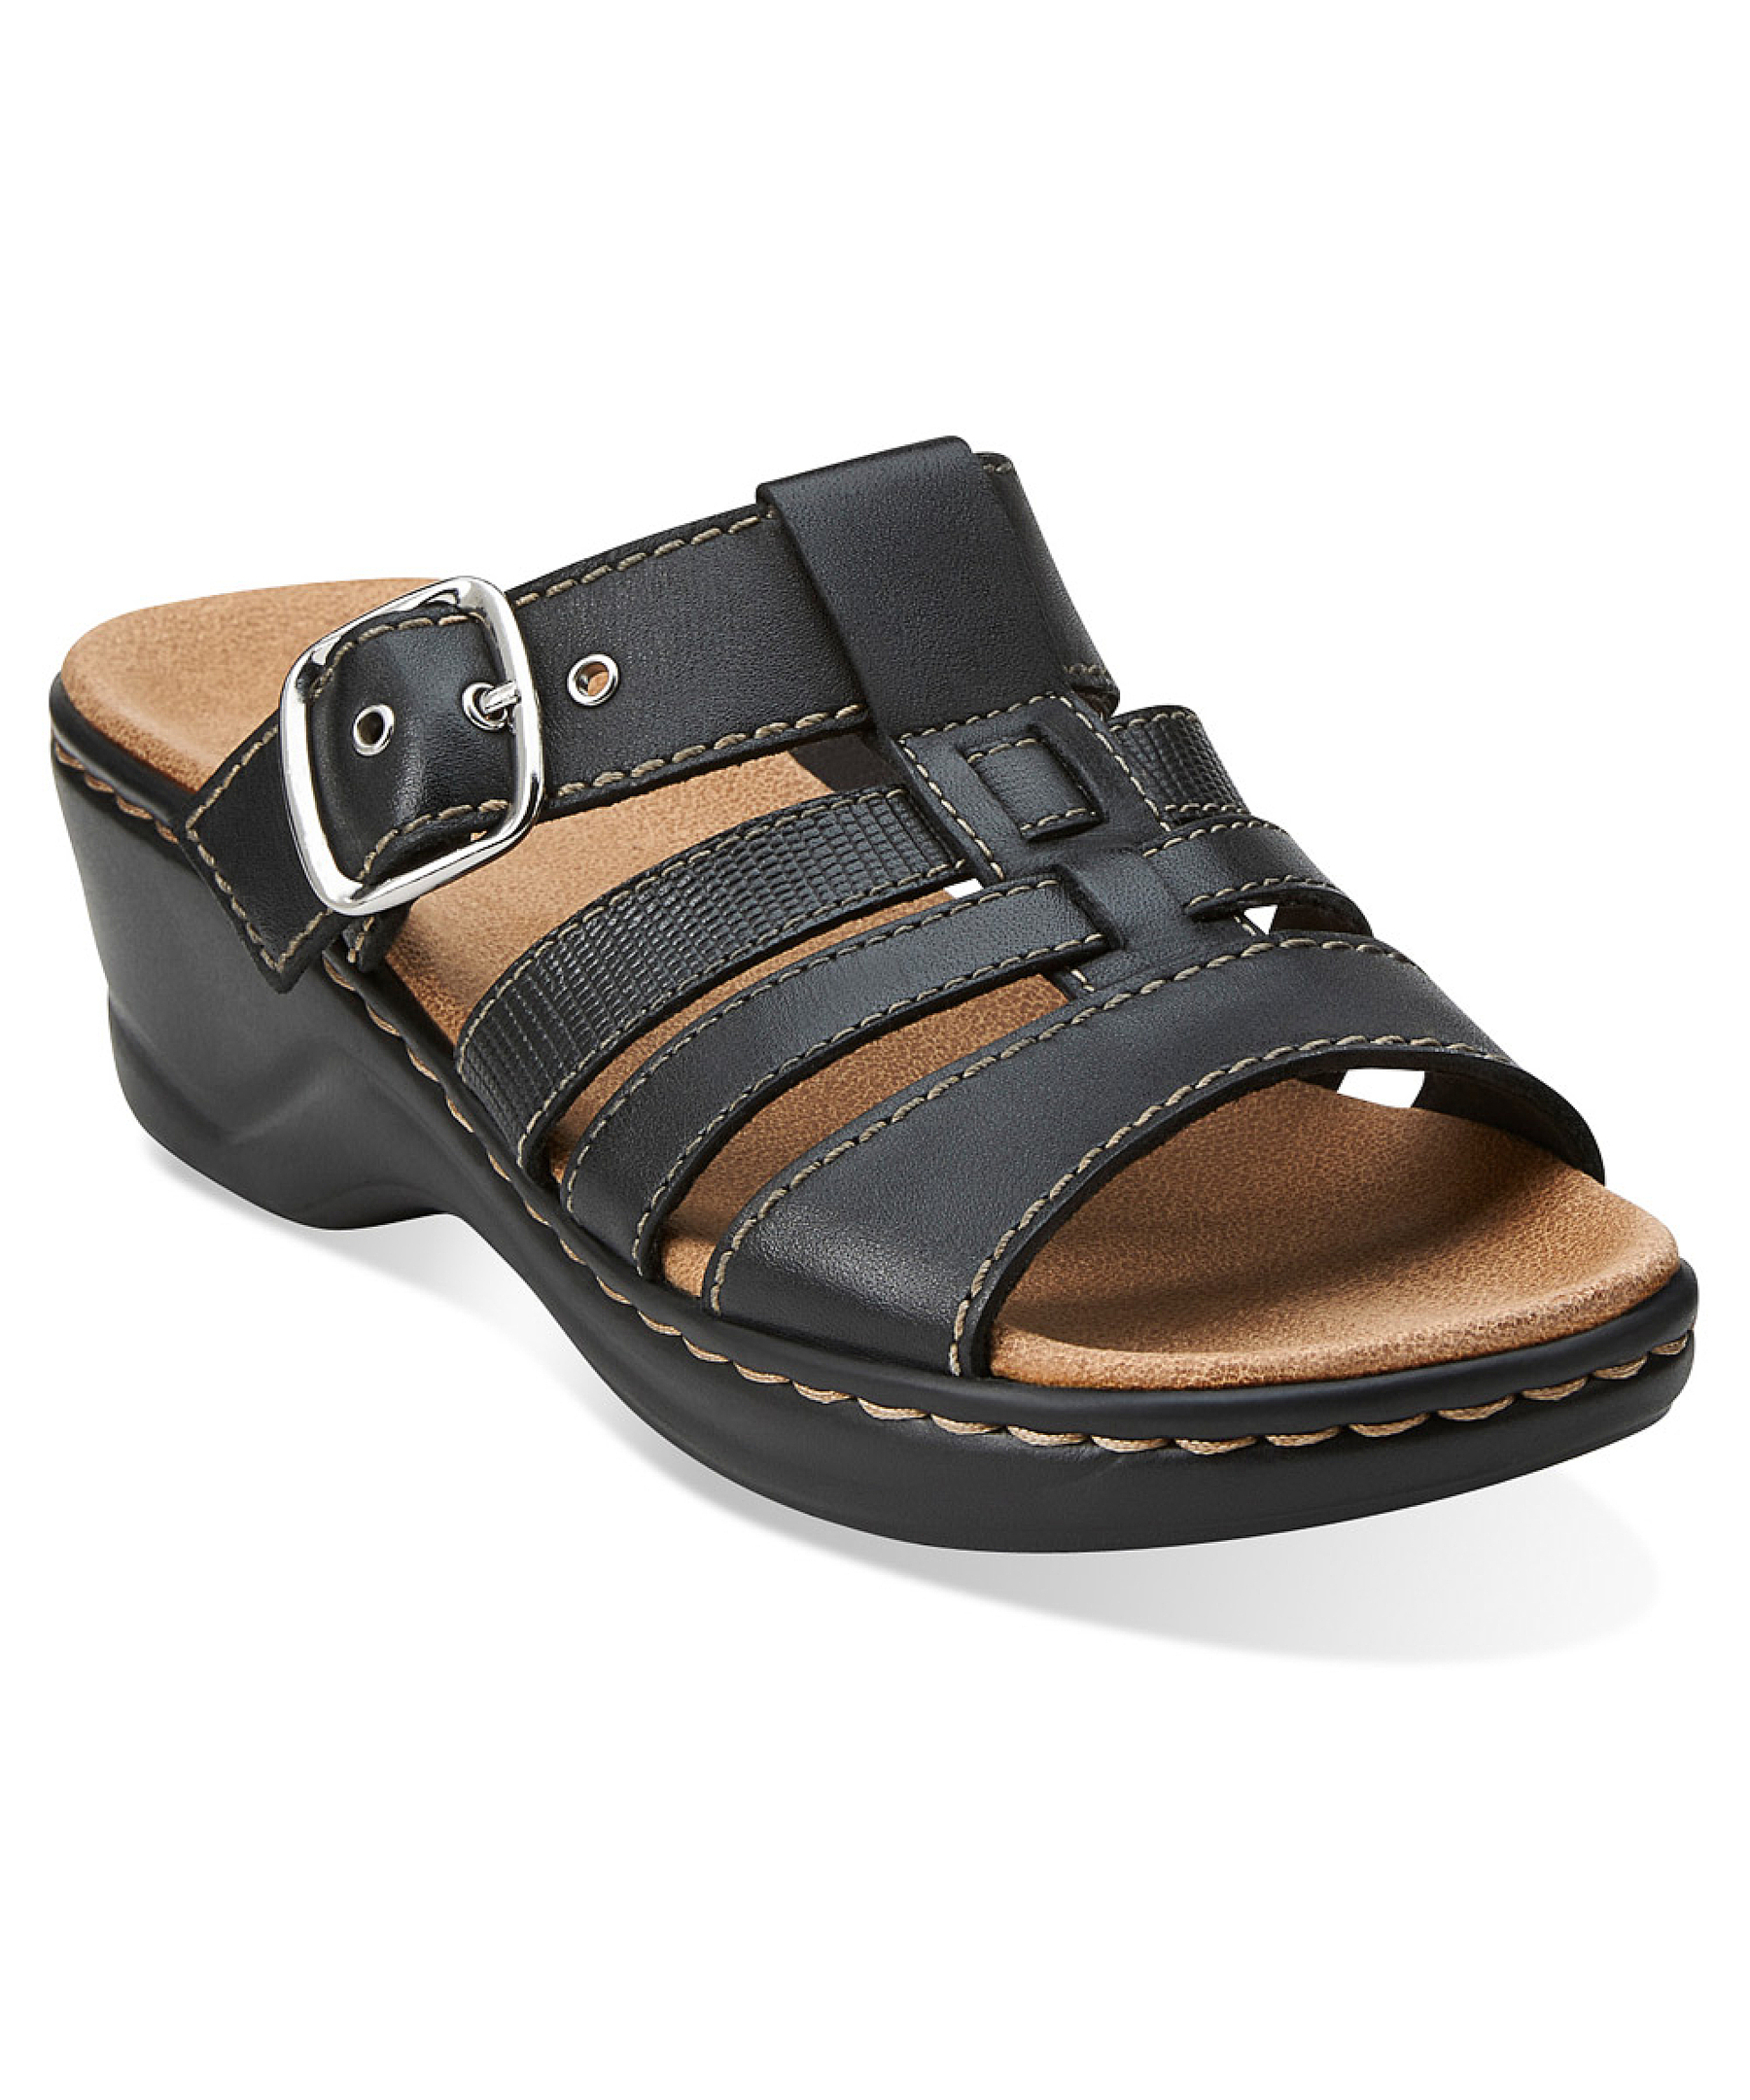 Clarks Women S Lexi Alloy Sandals In Black Lyst